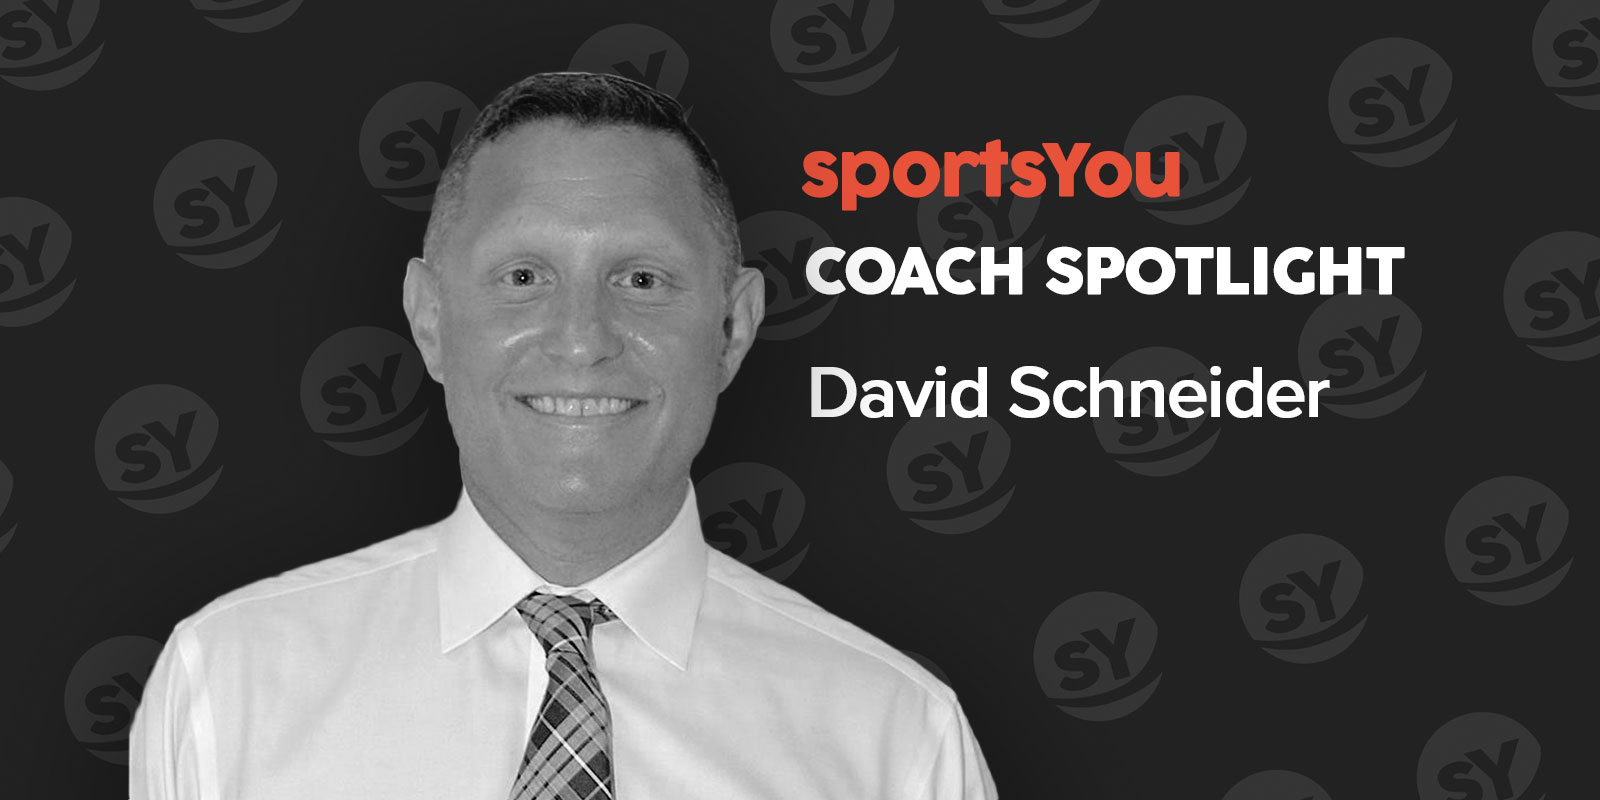 sportsYou Coach Spotlight: Q&A with Coach David Schneider